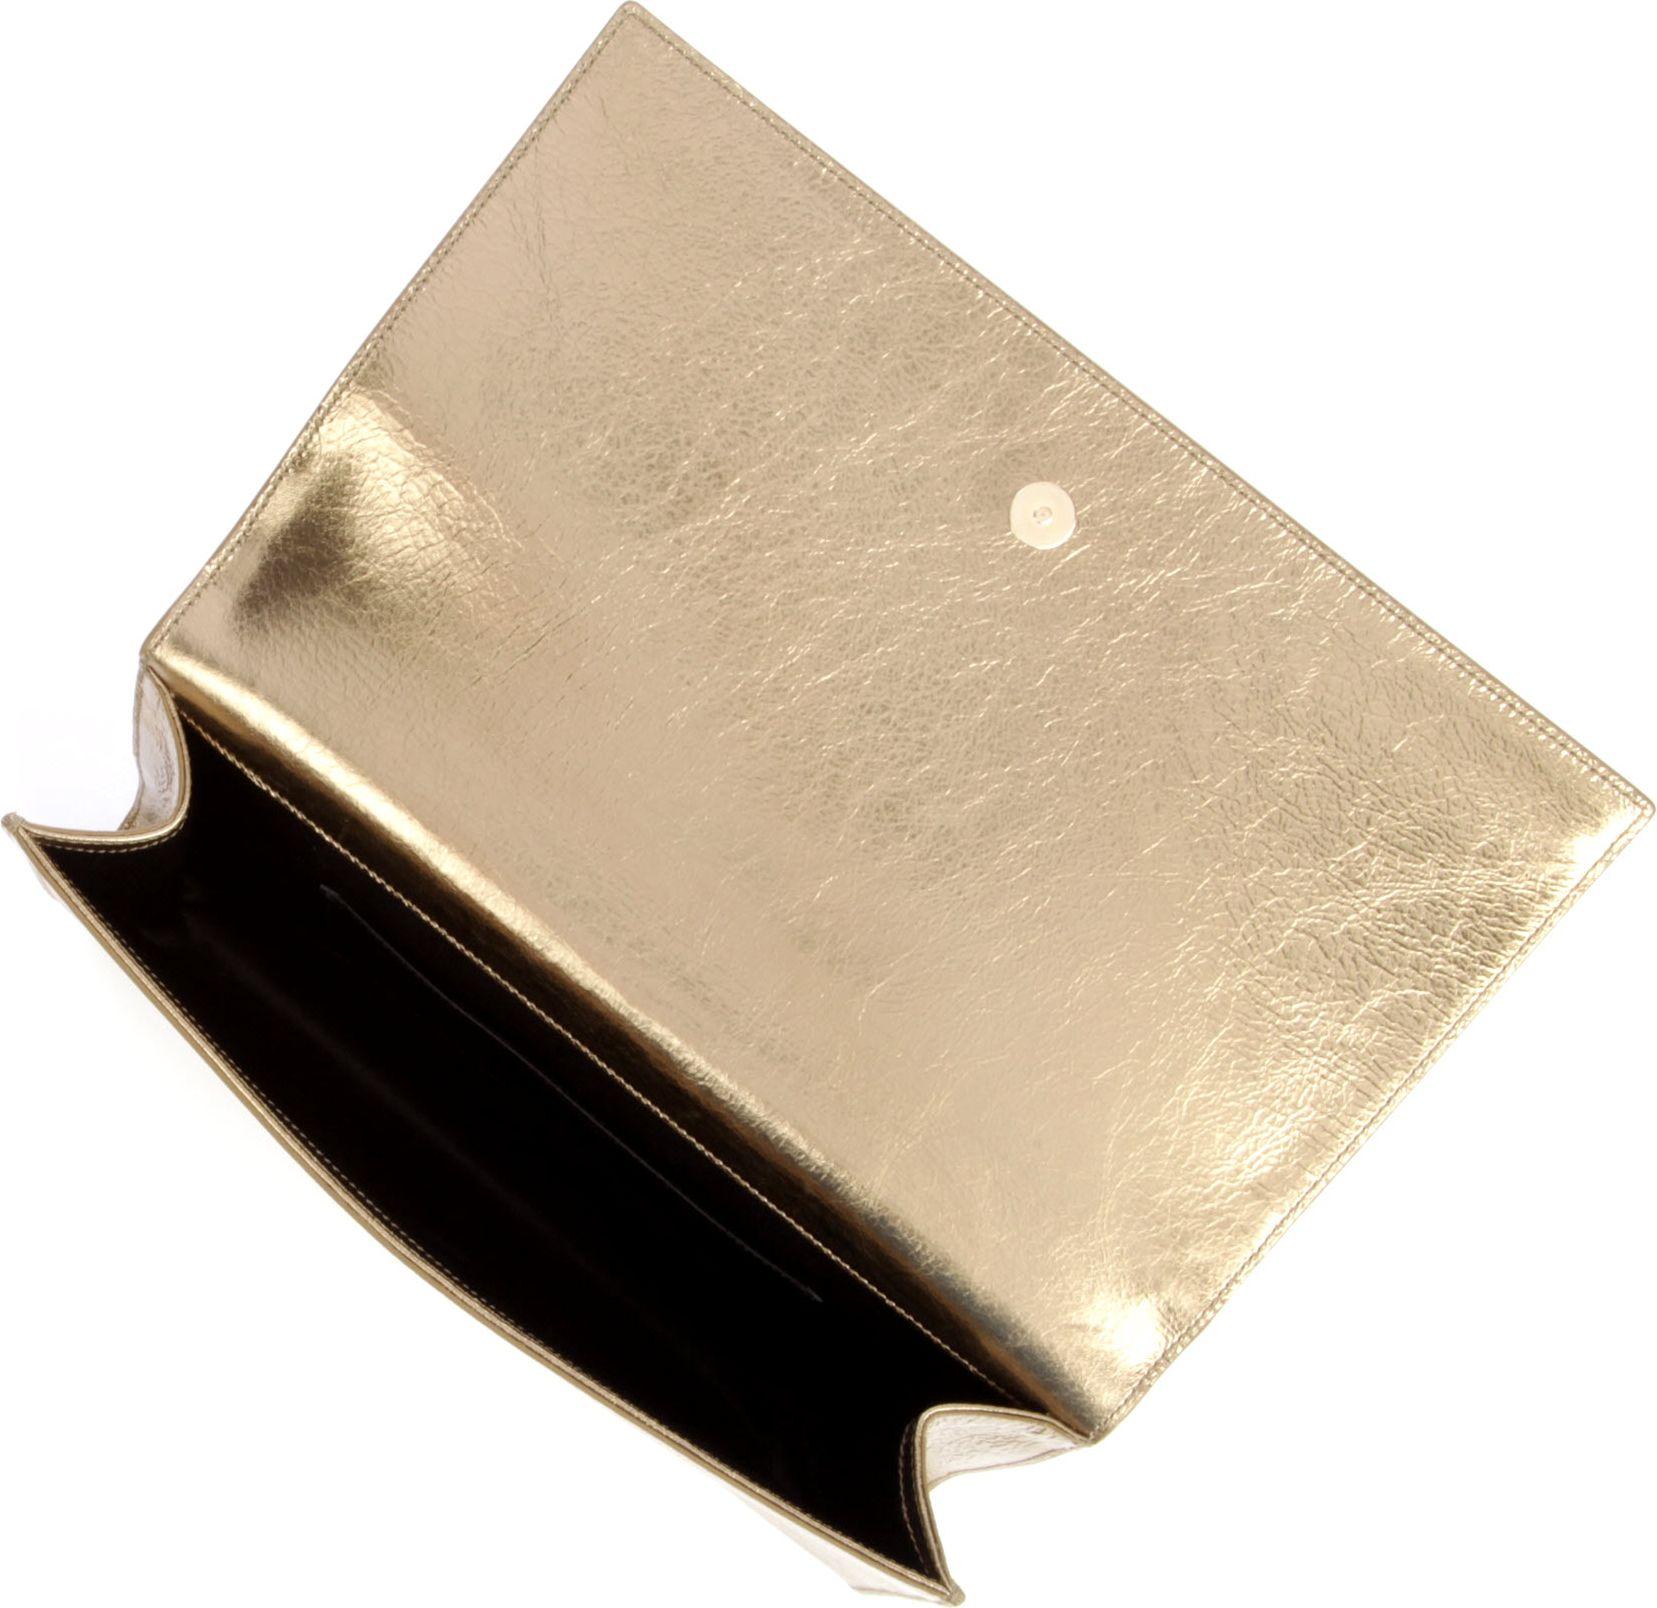 7595a8def862 Saint Laurent Belle Du Jour Clutch in Metallic - Lyst